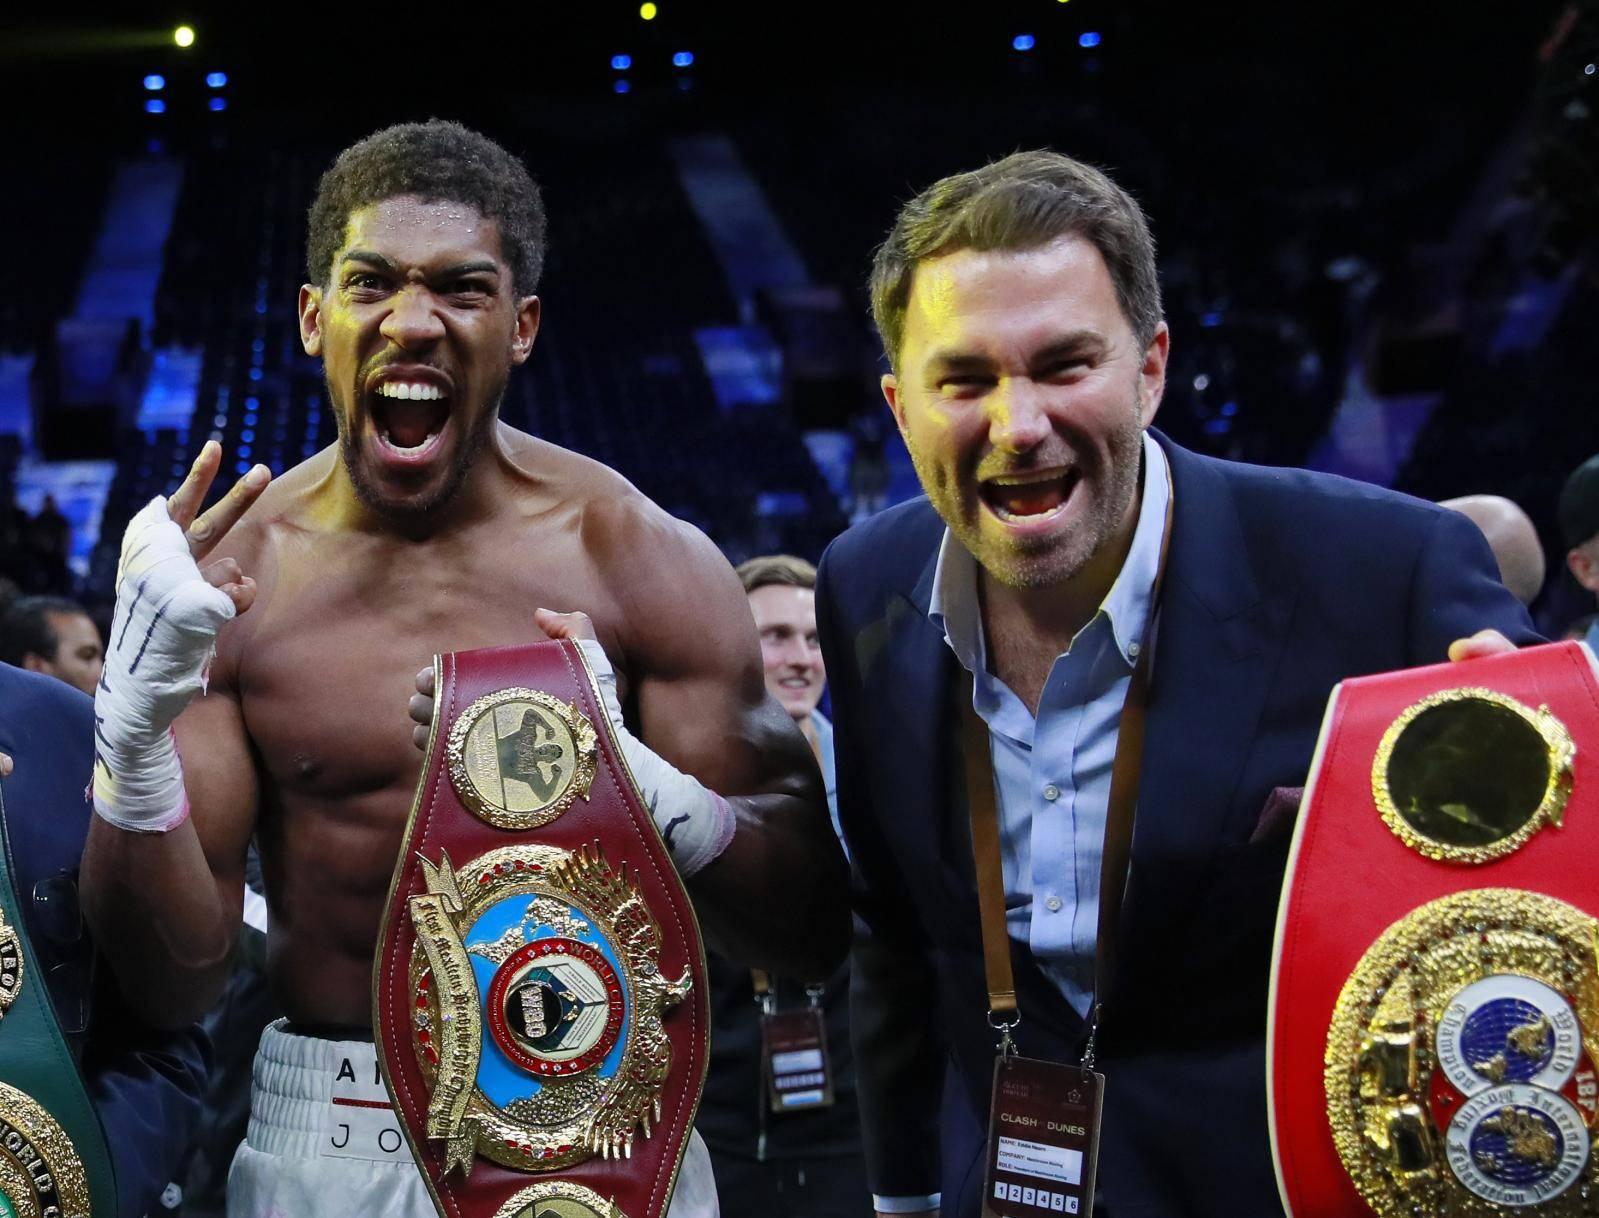 Andy Ruiz Jr v Anthony Joshua - IBF, WBA, WBO & IBO World Heavyweight Titles